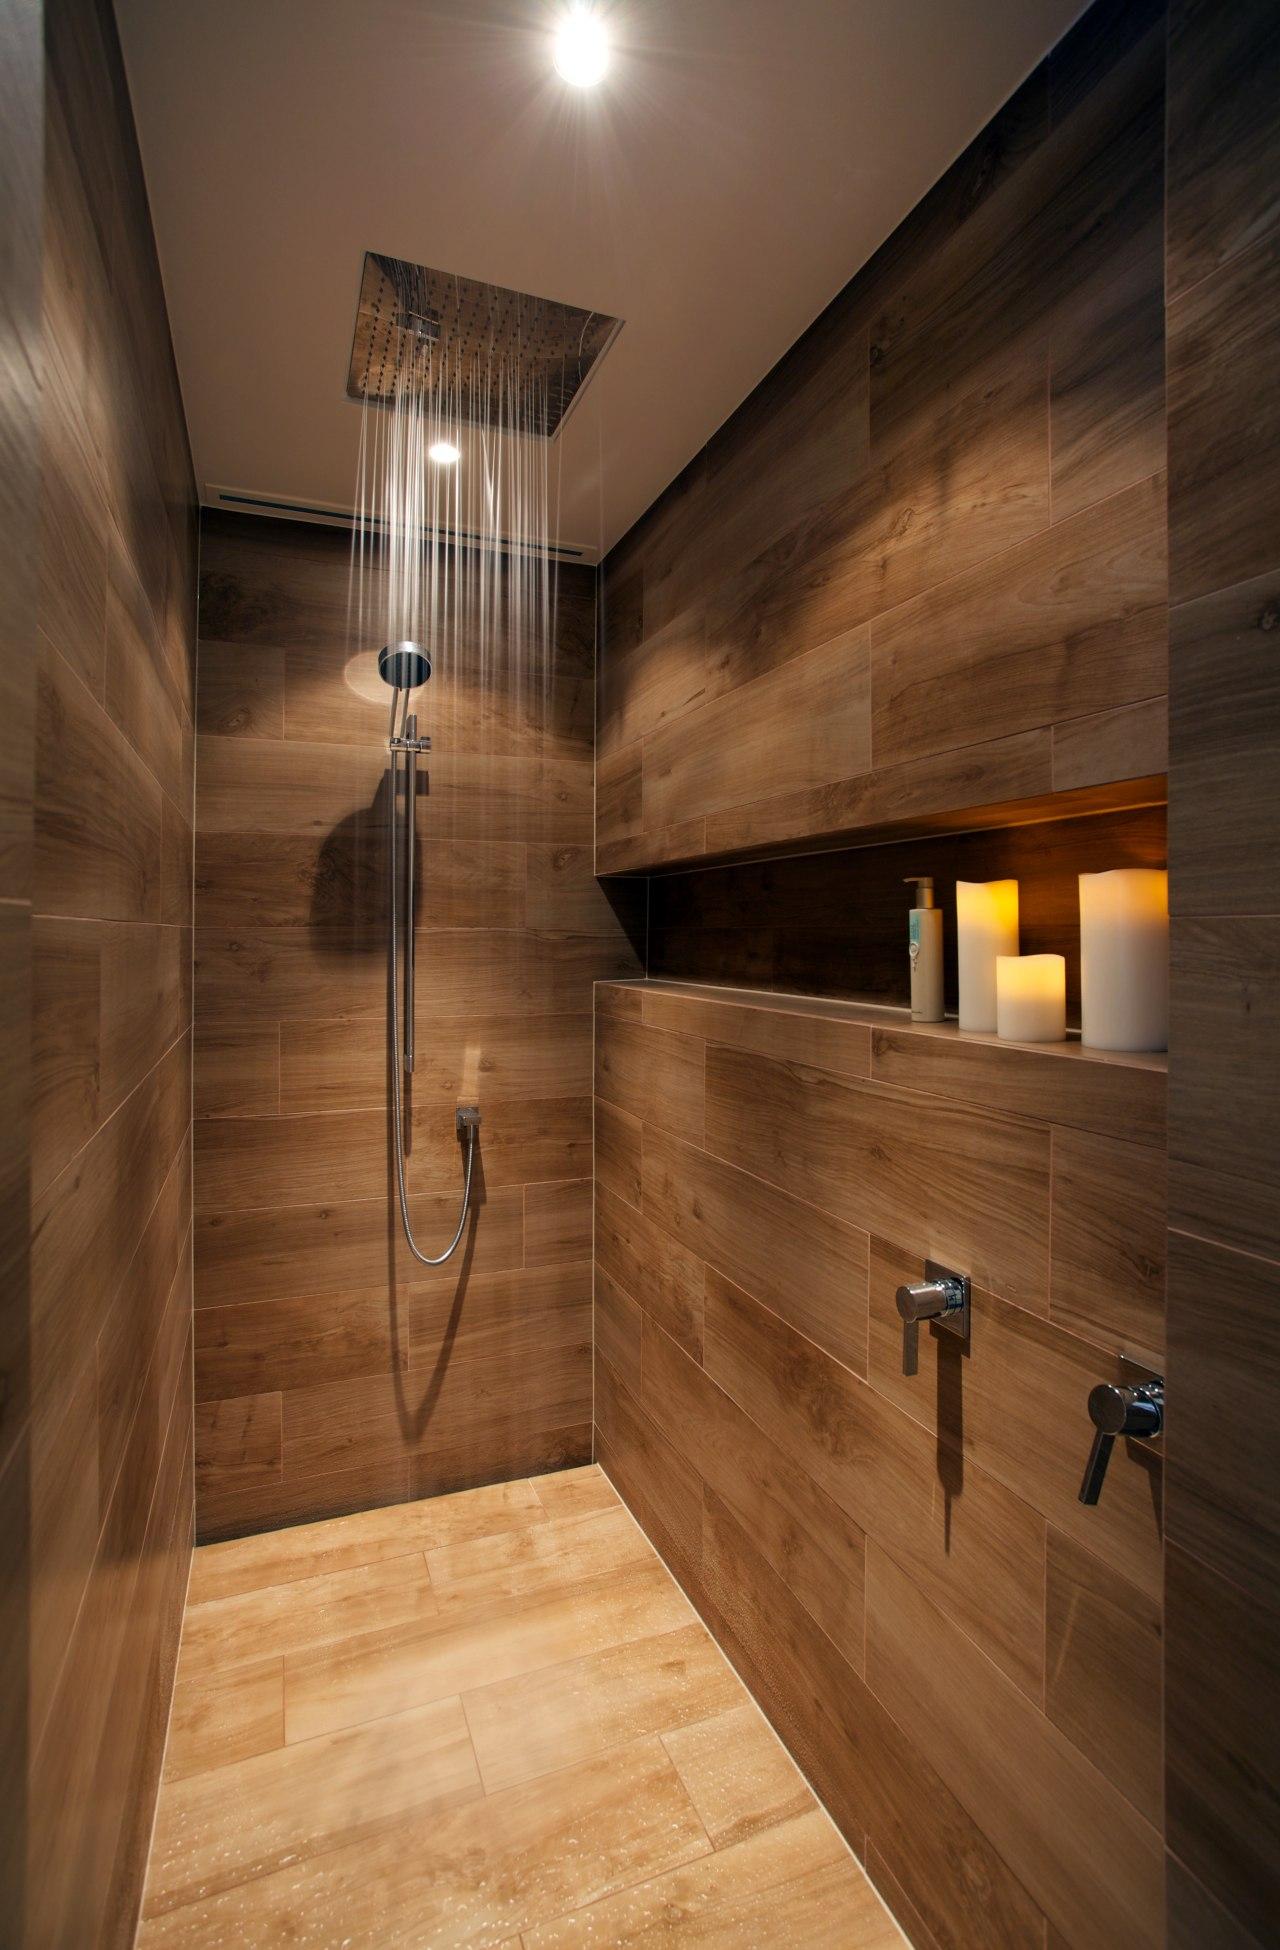 Italian porcelain tiles resembling timber planks contribute to architecture, bathroom, floor, flooring, hardwood, interior design, laminate flooring, lighting, room, tile, wall, wood, wood flooring, wood stain, brown